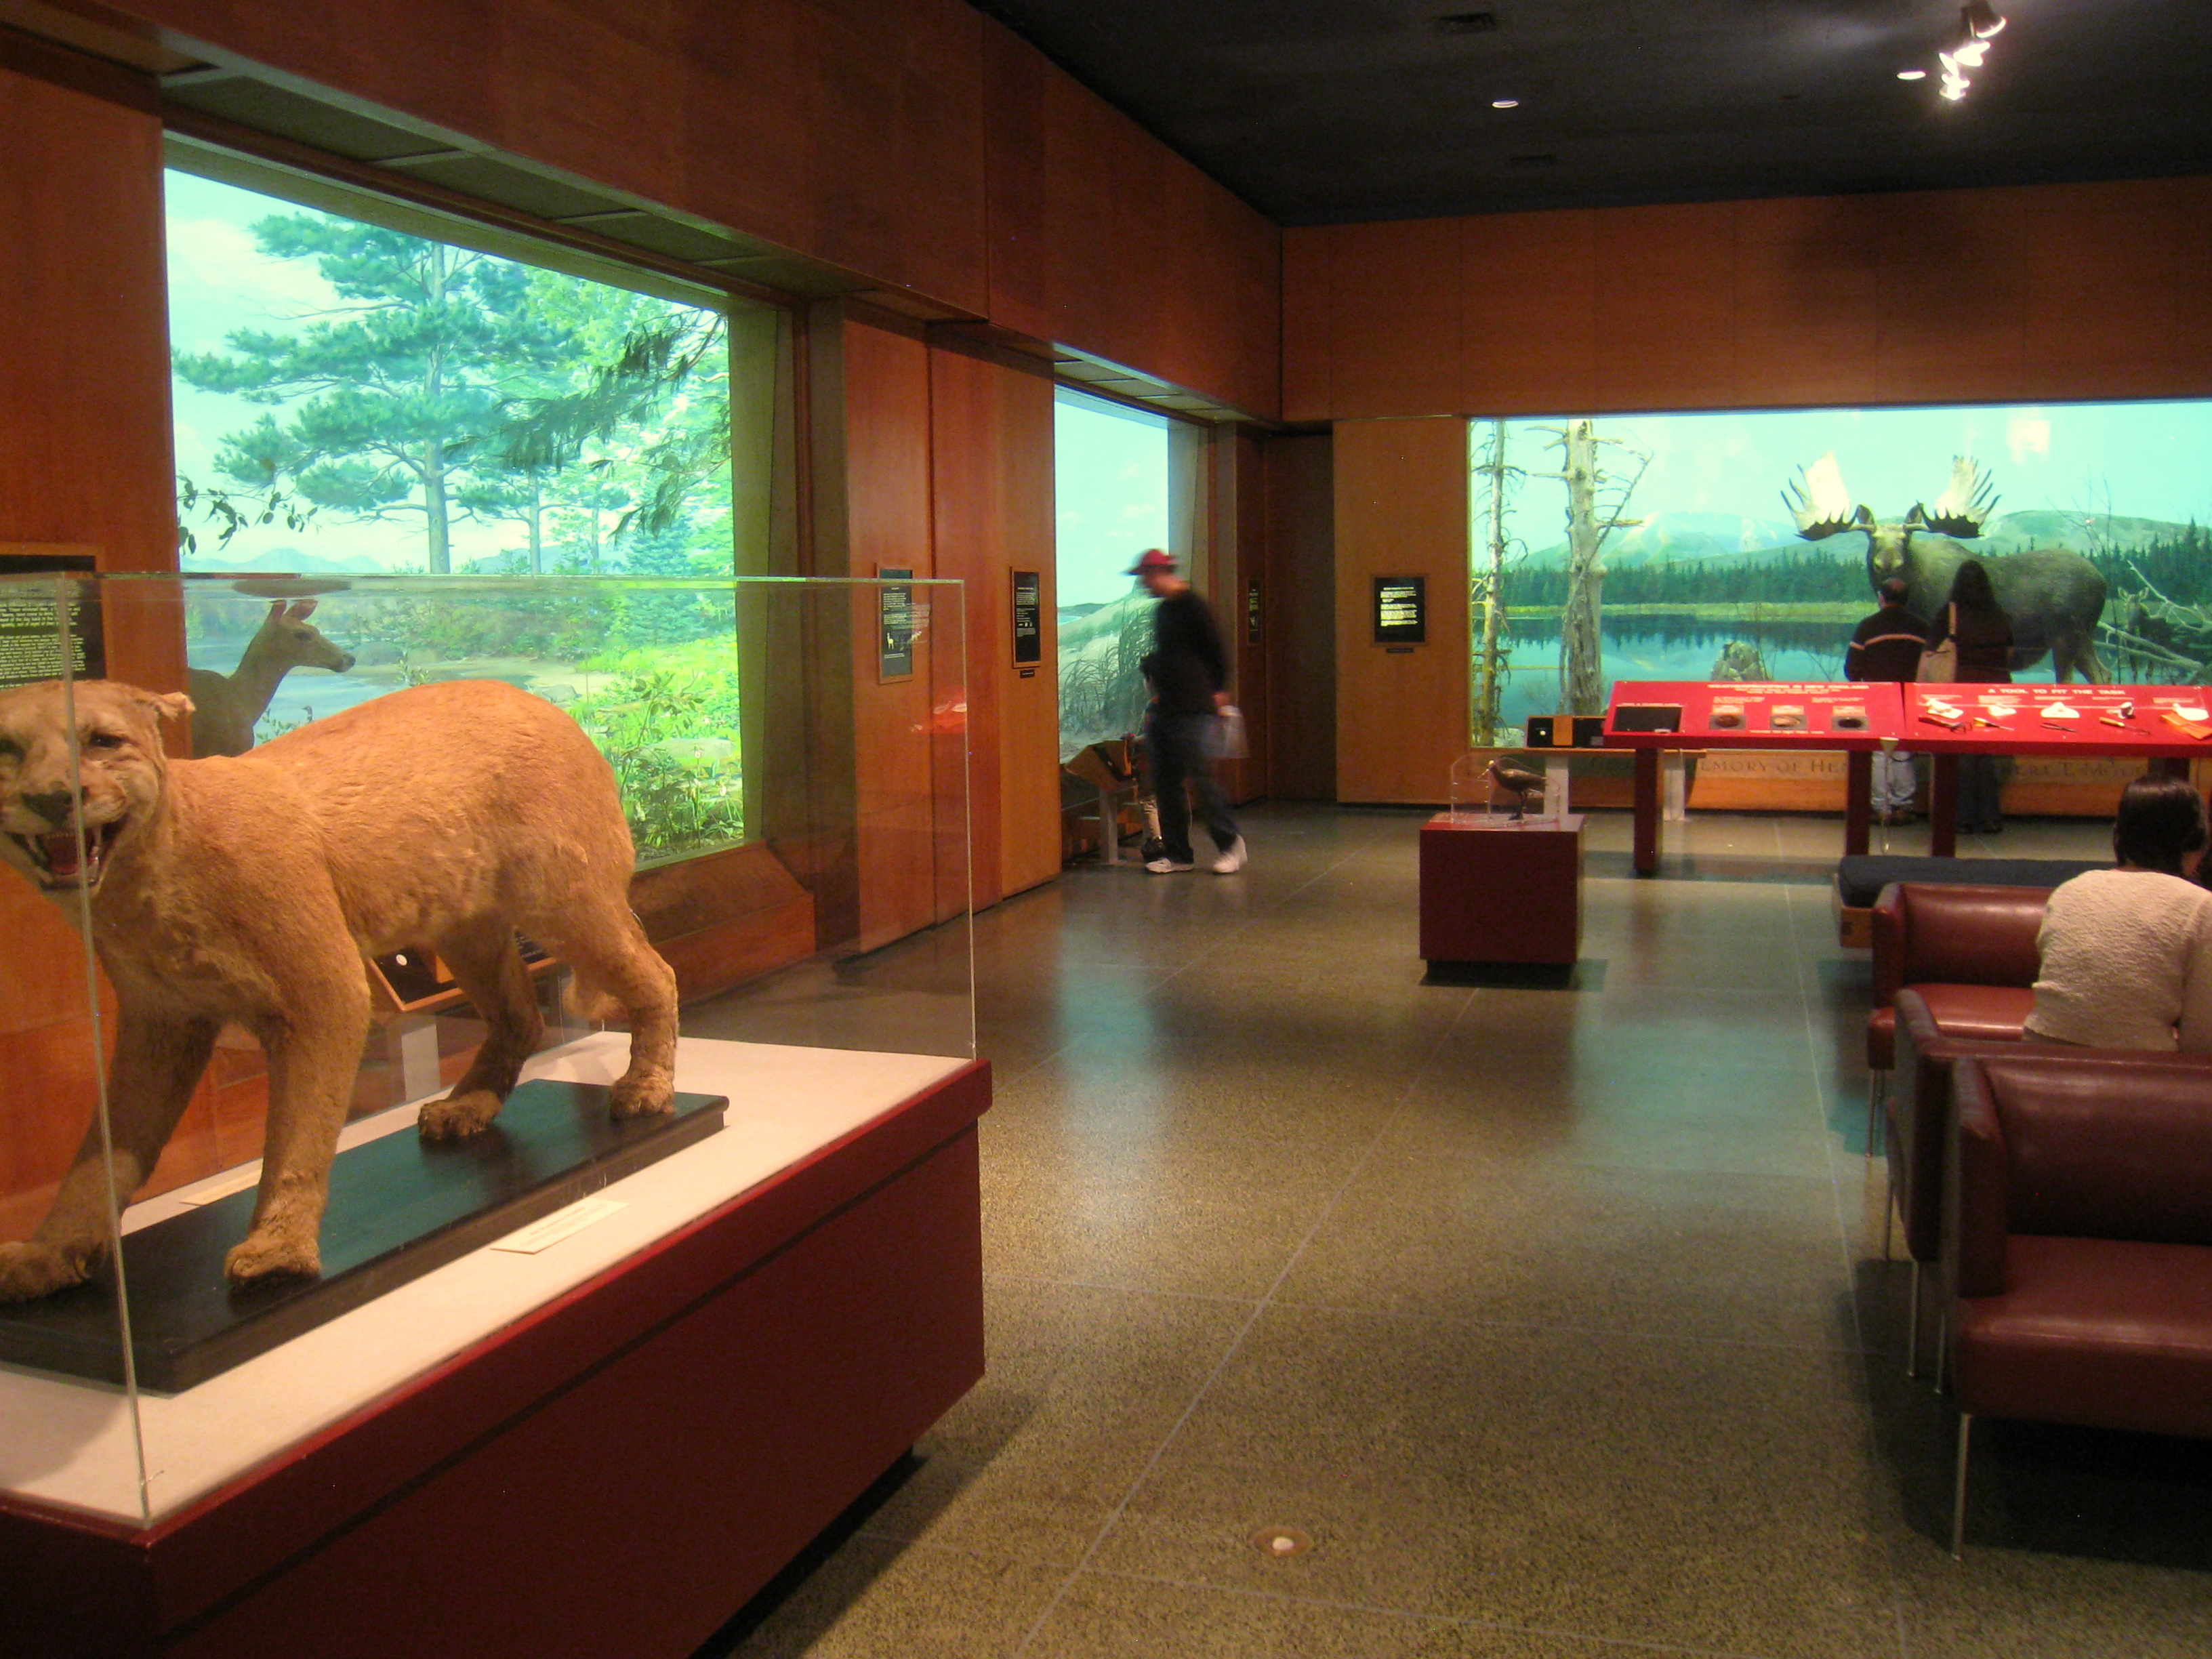 File:Museum of Science, Boston, MA - IMG 3282.JPG